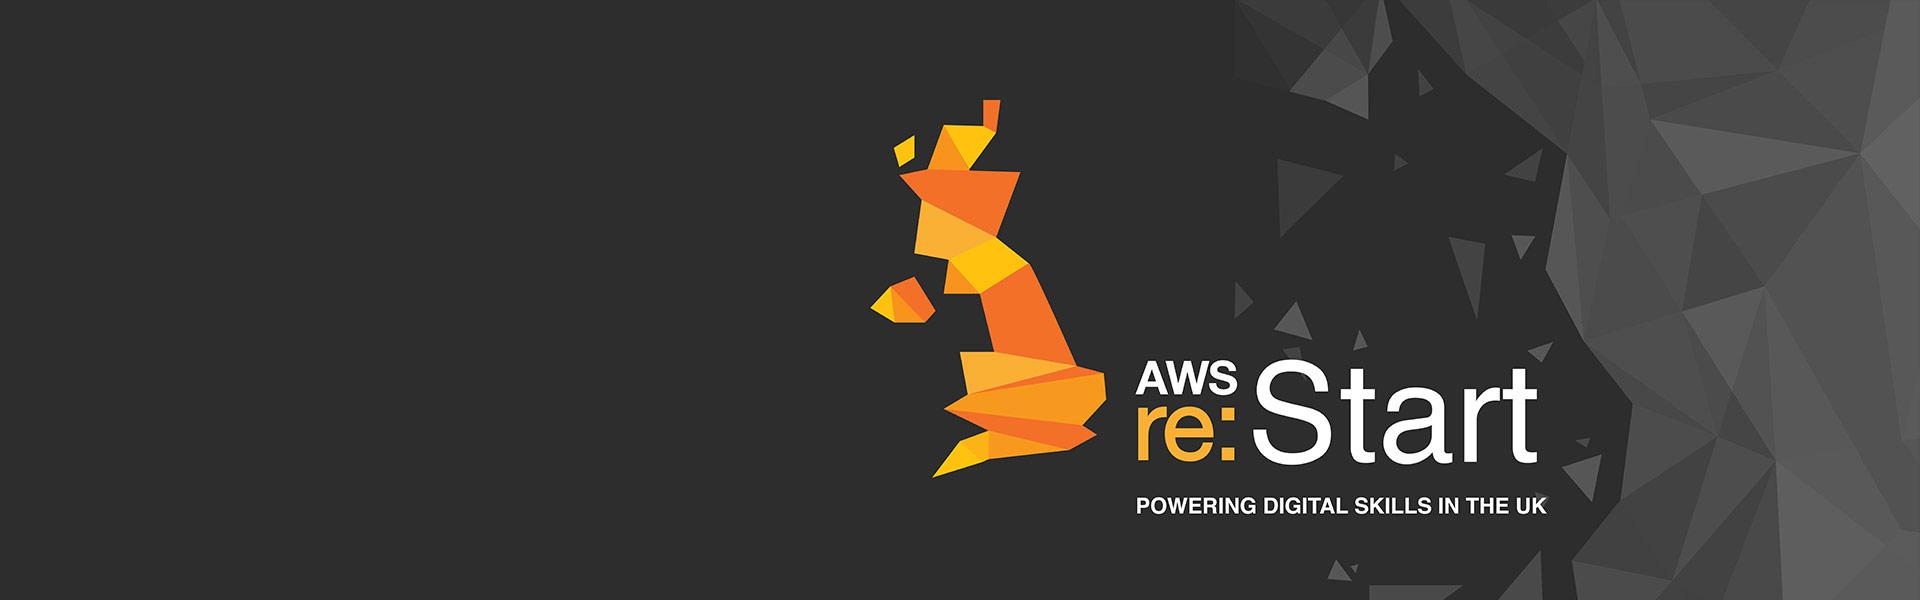 Amazon Web Services' re:Start programme